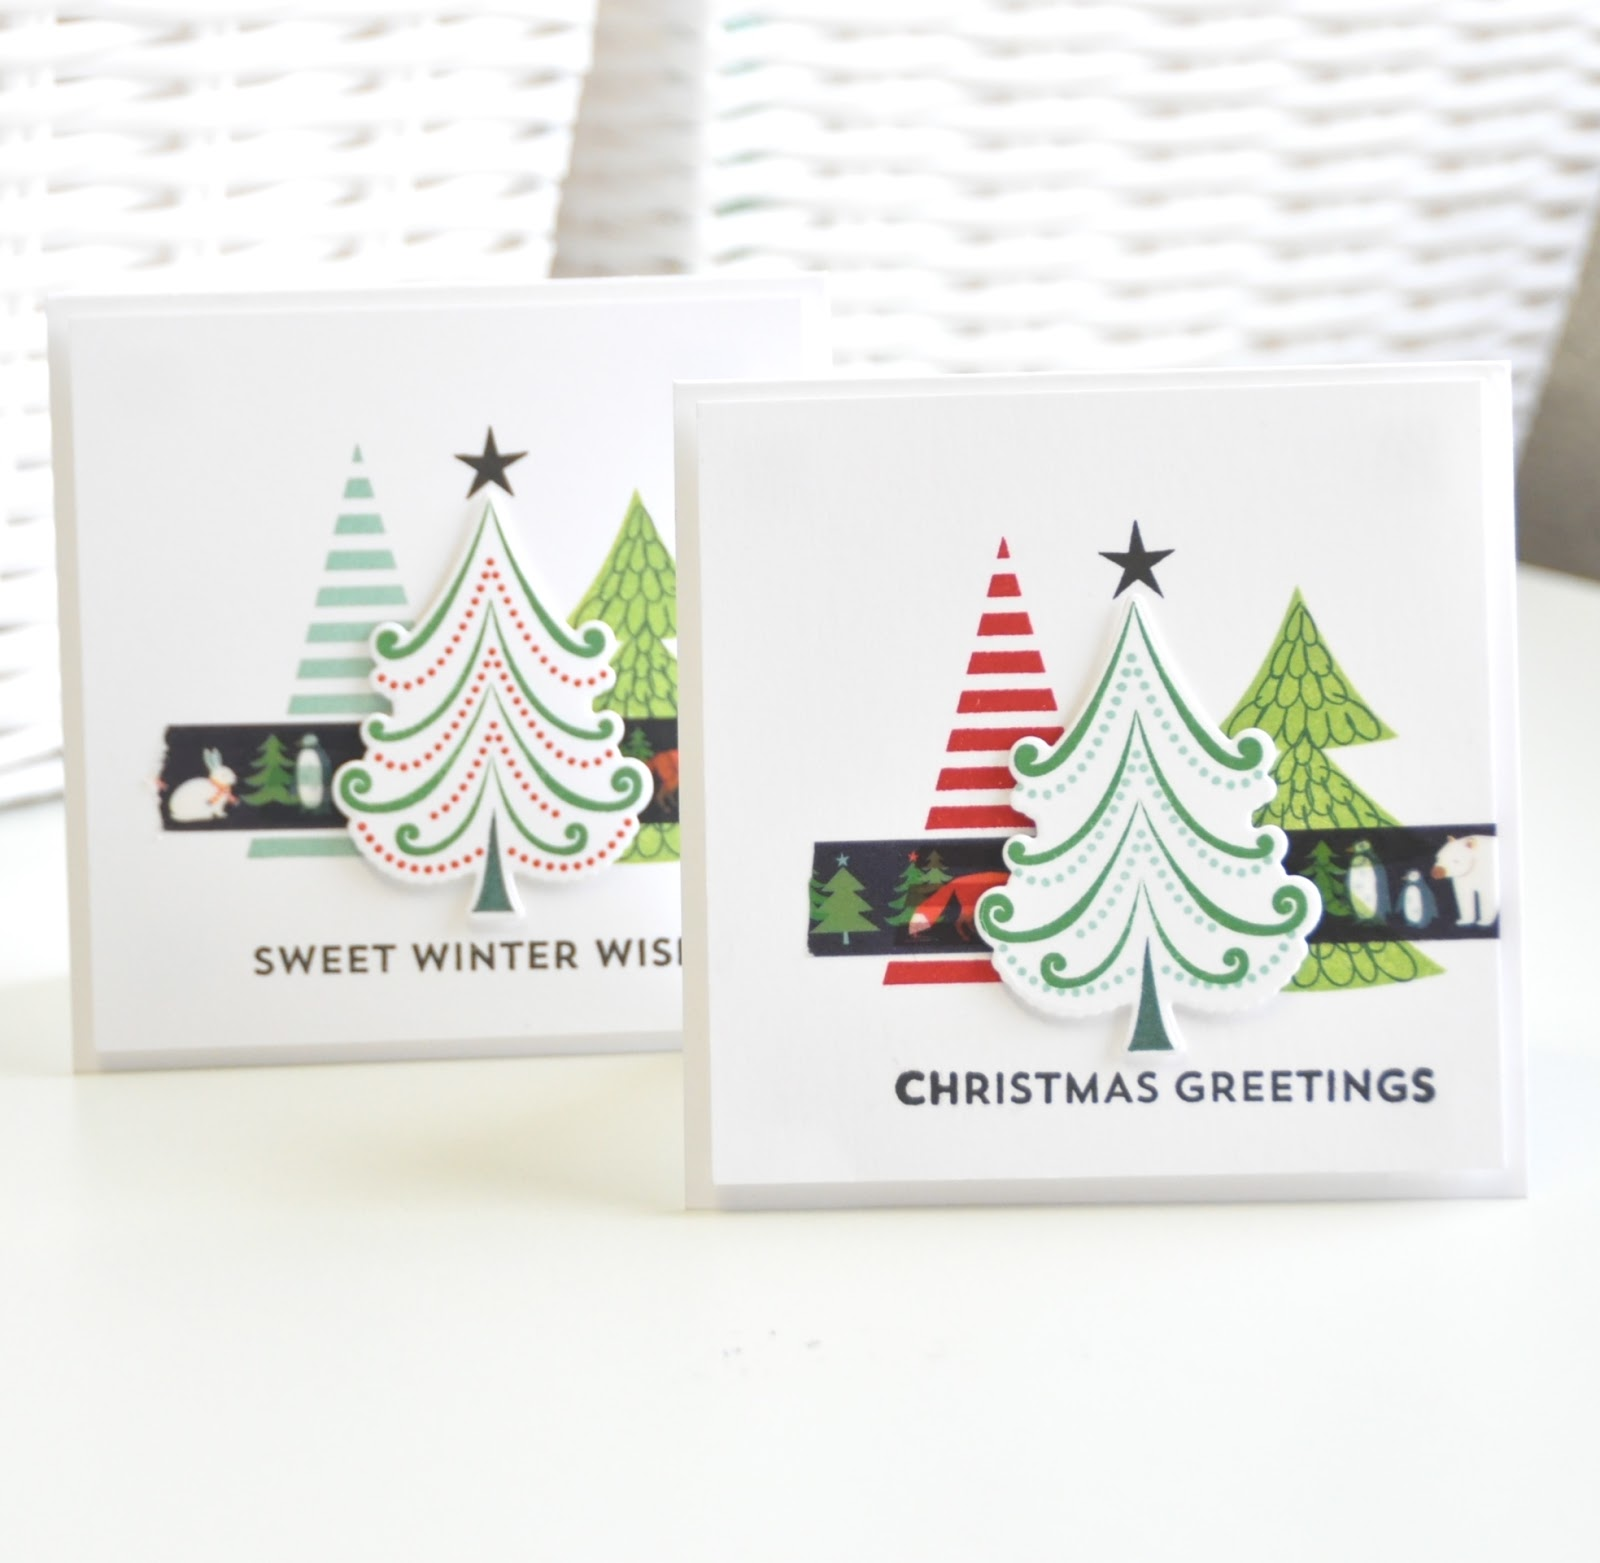 Chez Parmentier: Drie x Kerst #6.. MFT - Oh Christmas trees